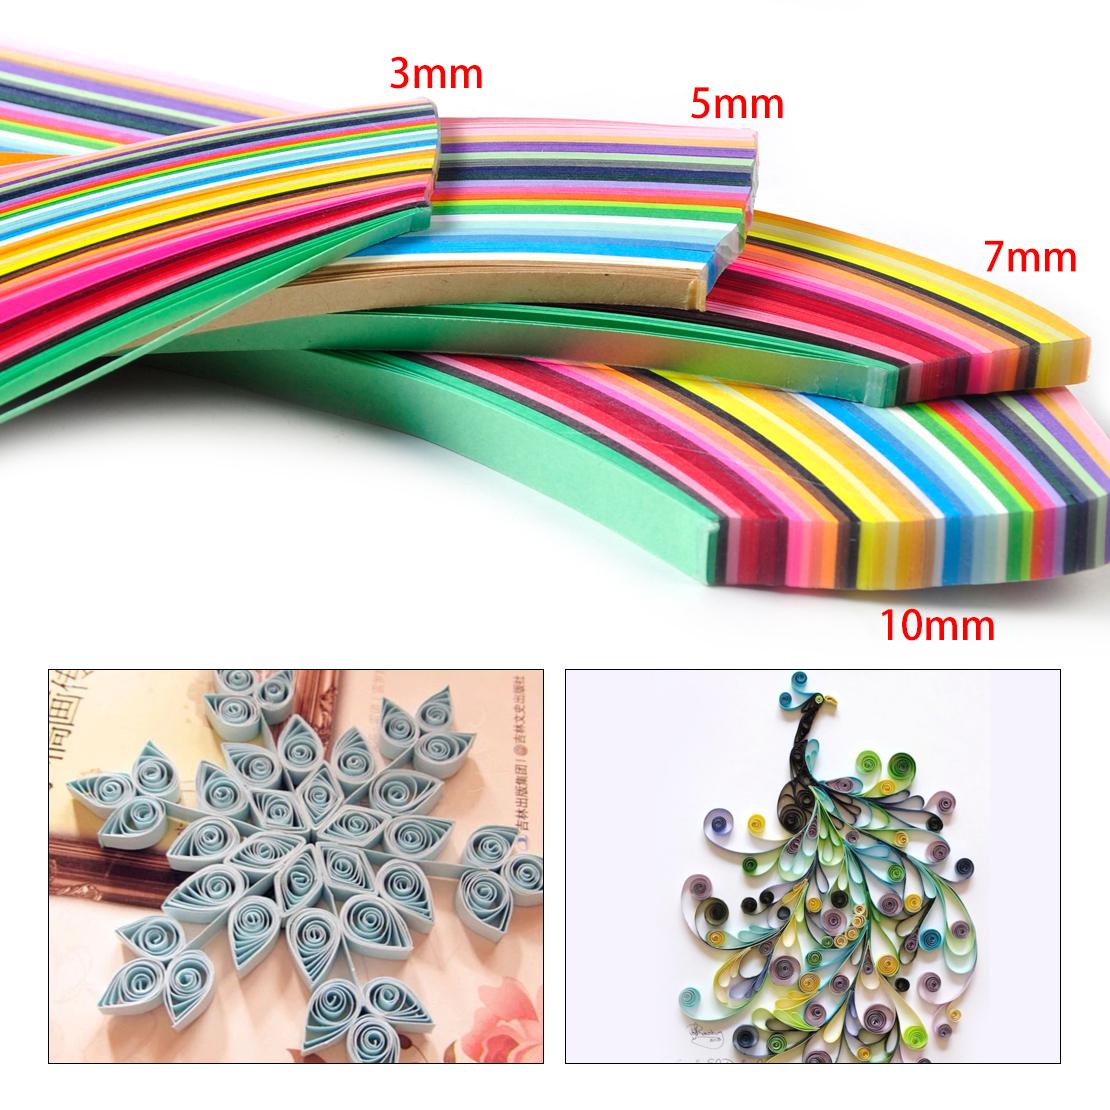 3mm 720Pcs Paper Quilling Strips 36 Colors 540mm-length